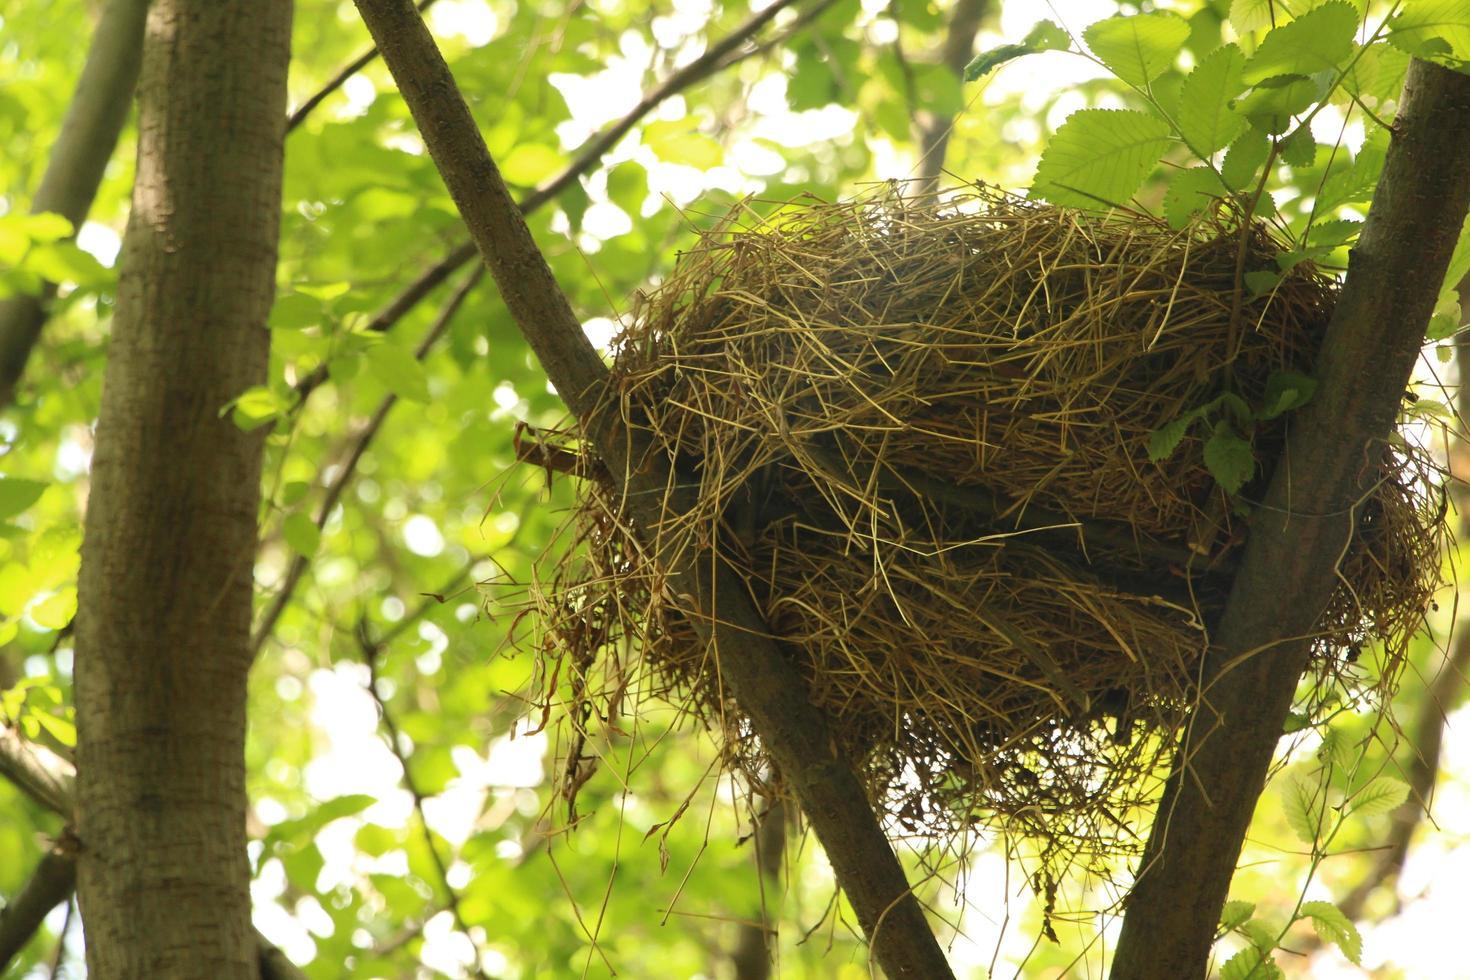 Bird's nest in a tree photo